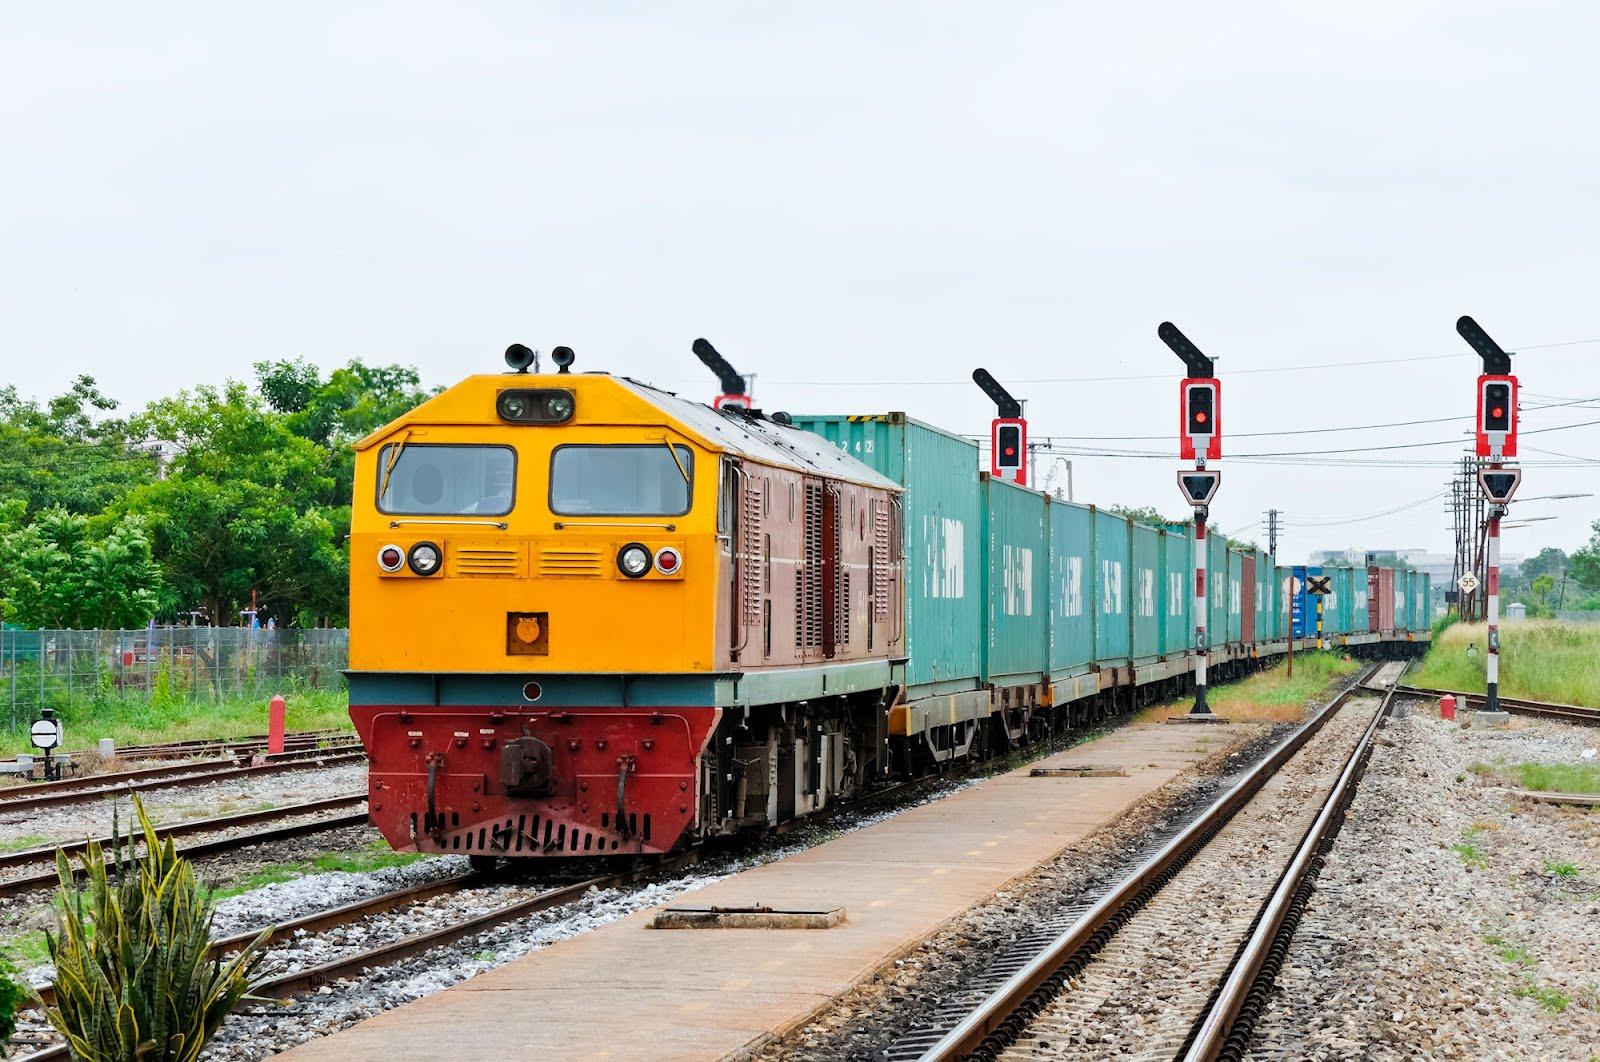 Fotos de trenes de carga 21